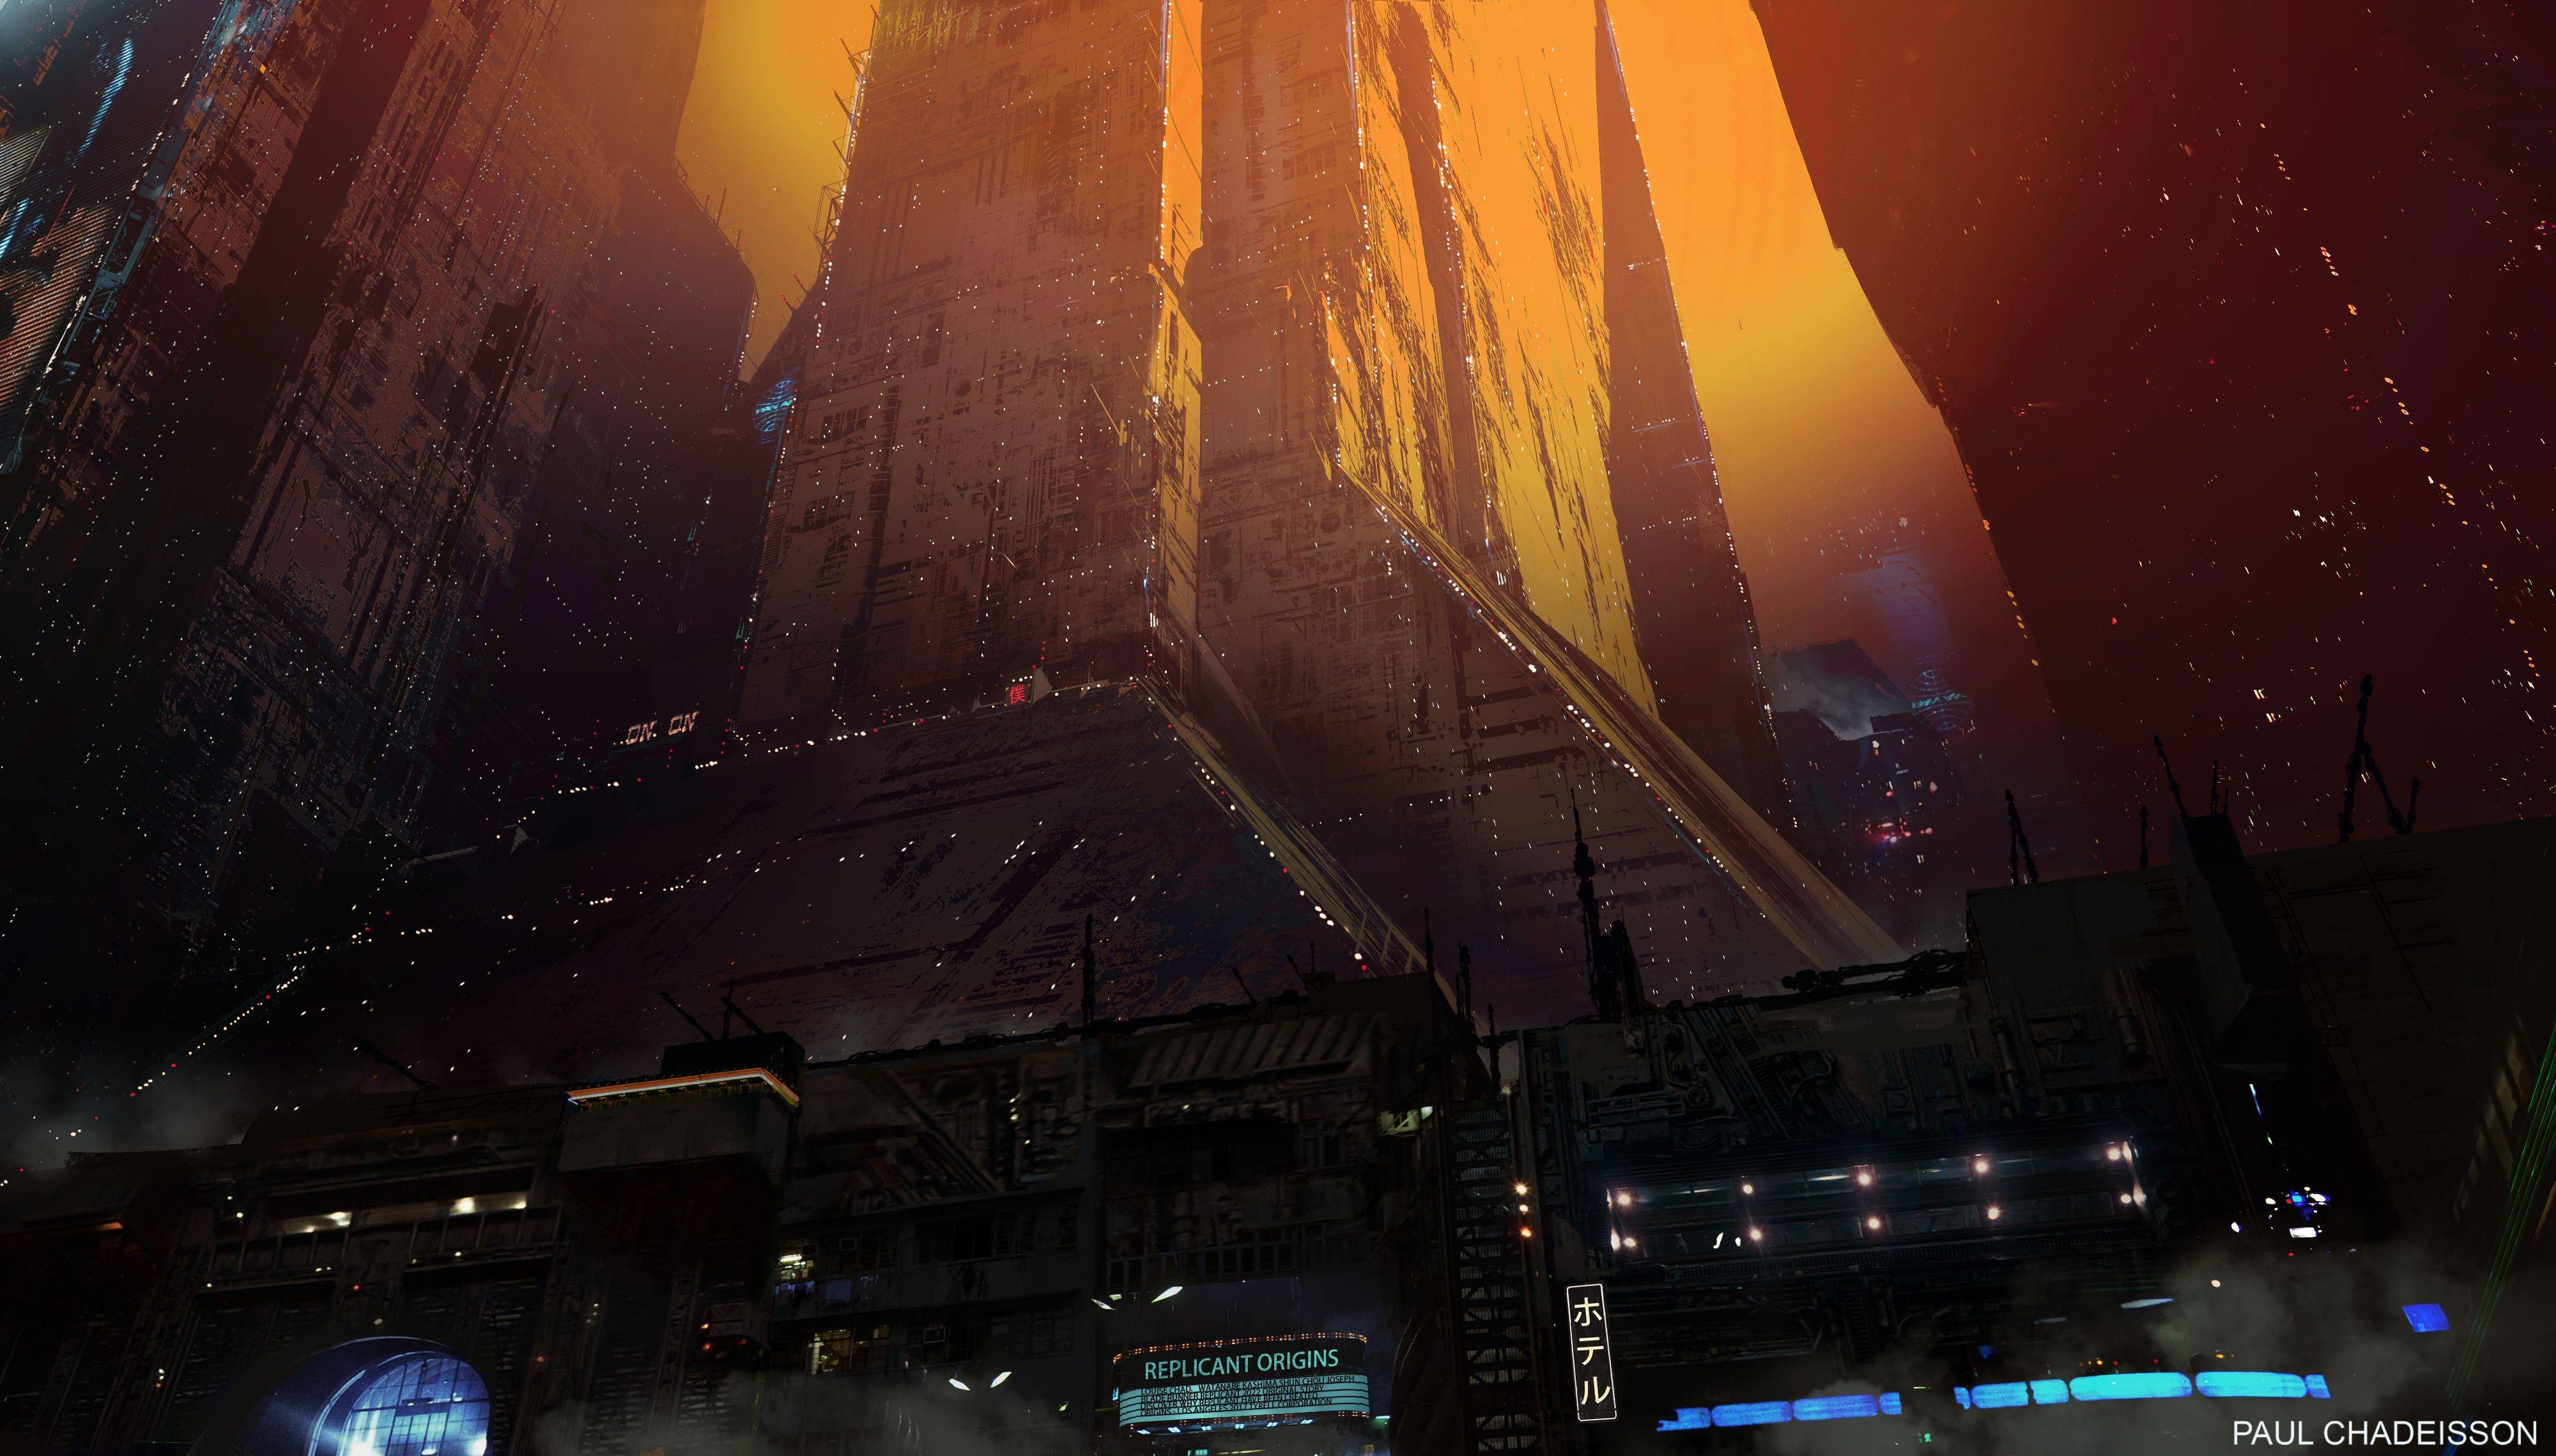 Blade Runner Wallpapers Top Free Blade Runner Backgrounds